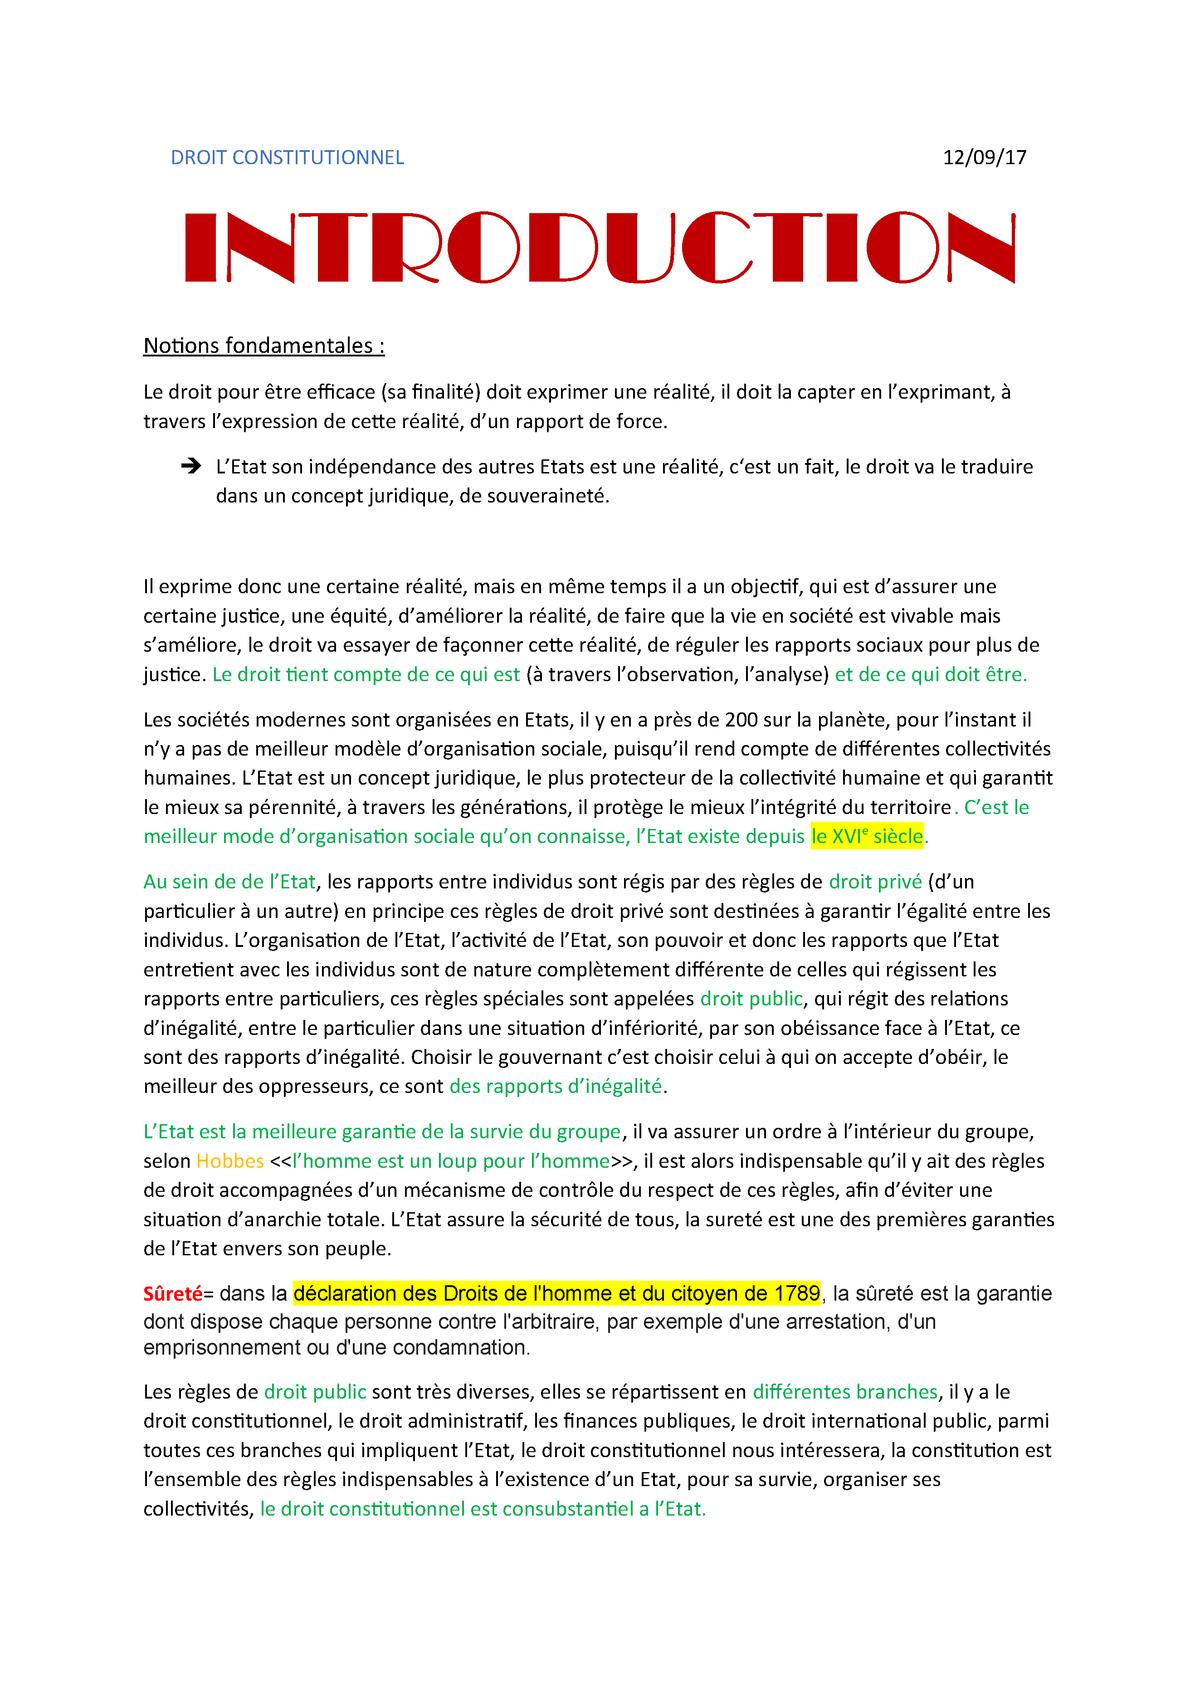 Droit constitutionnel - Unistra - StuDocu